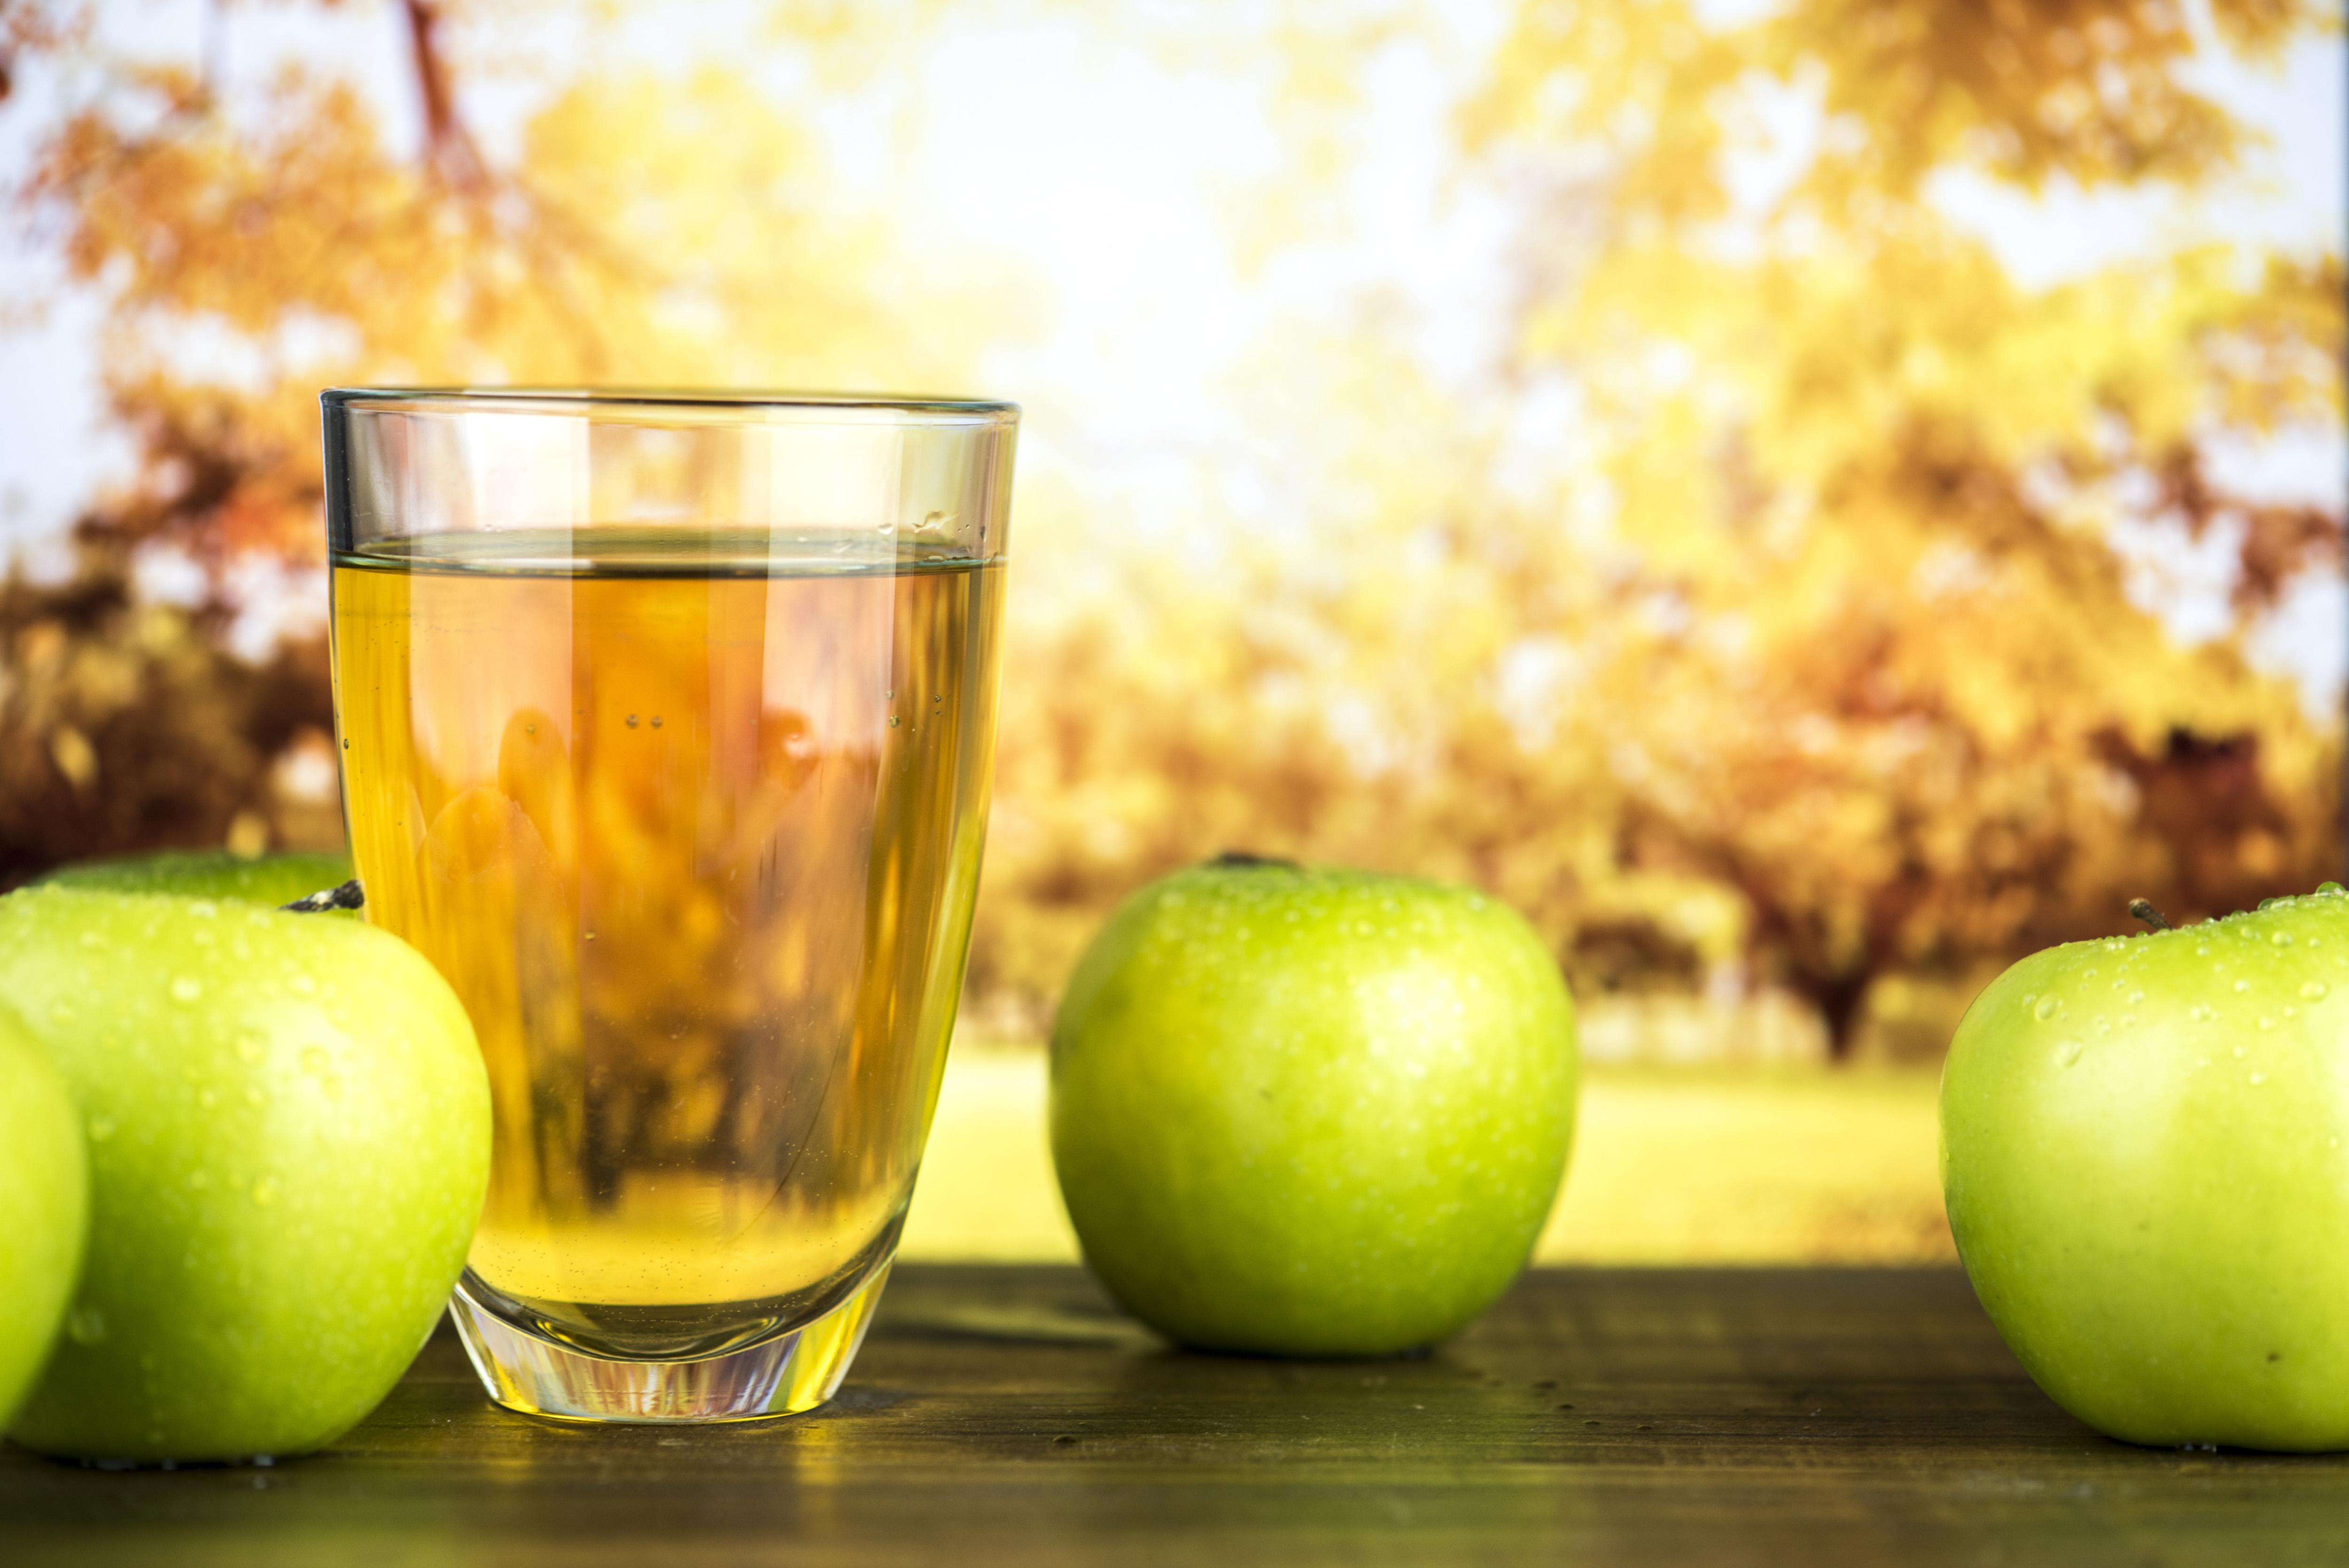 картинка сока яблочного отчасти вдохновили